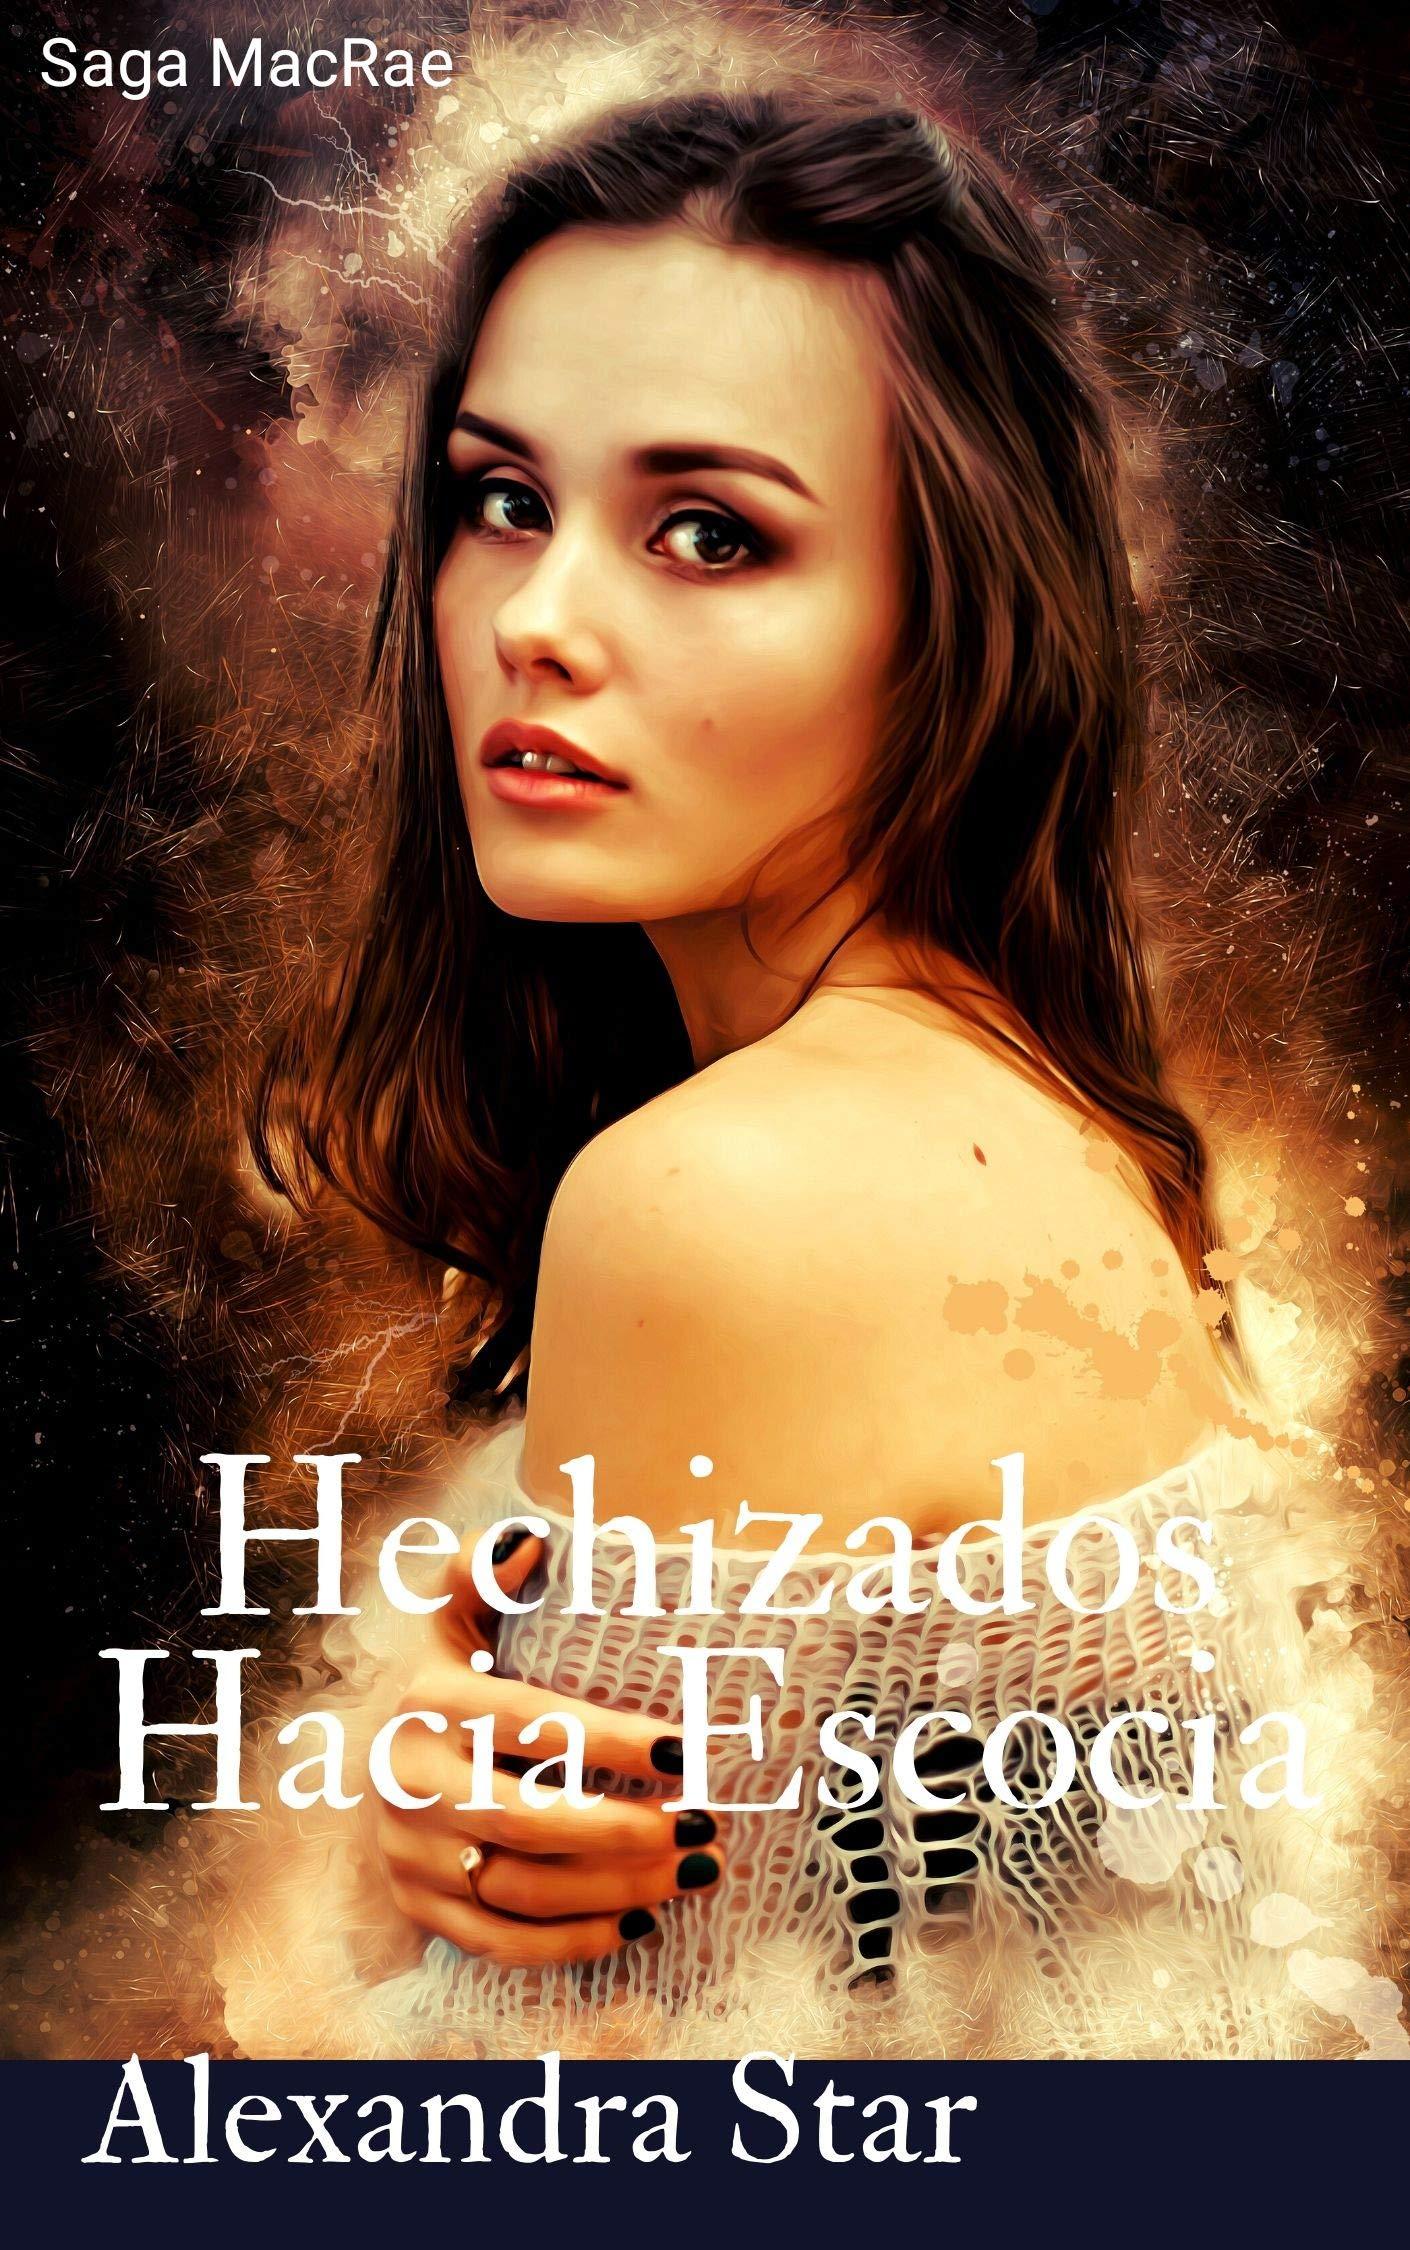 Hechizados Hacia Escocia (Serie MacRae nº 1) por Alexandra Star